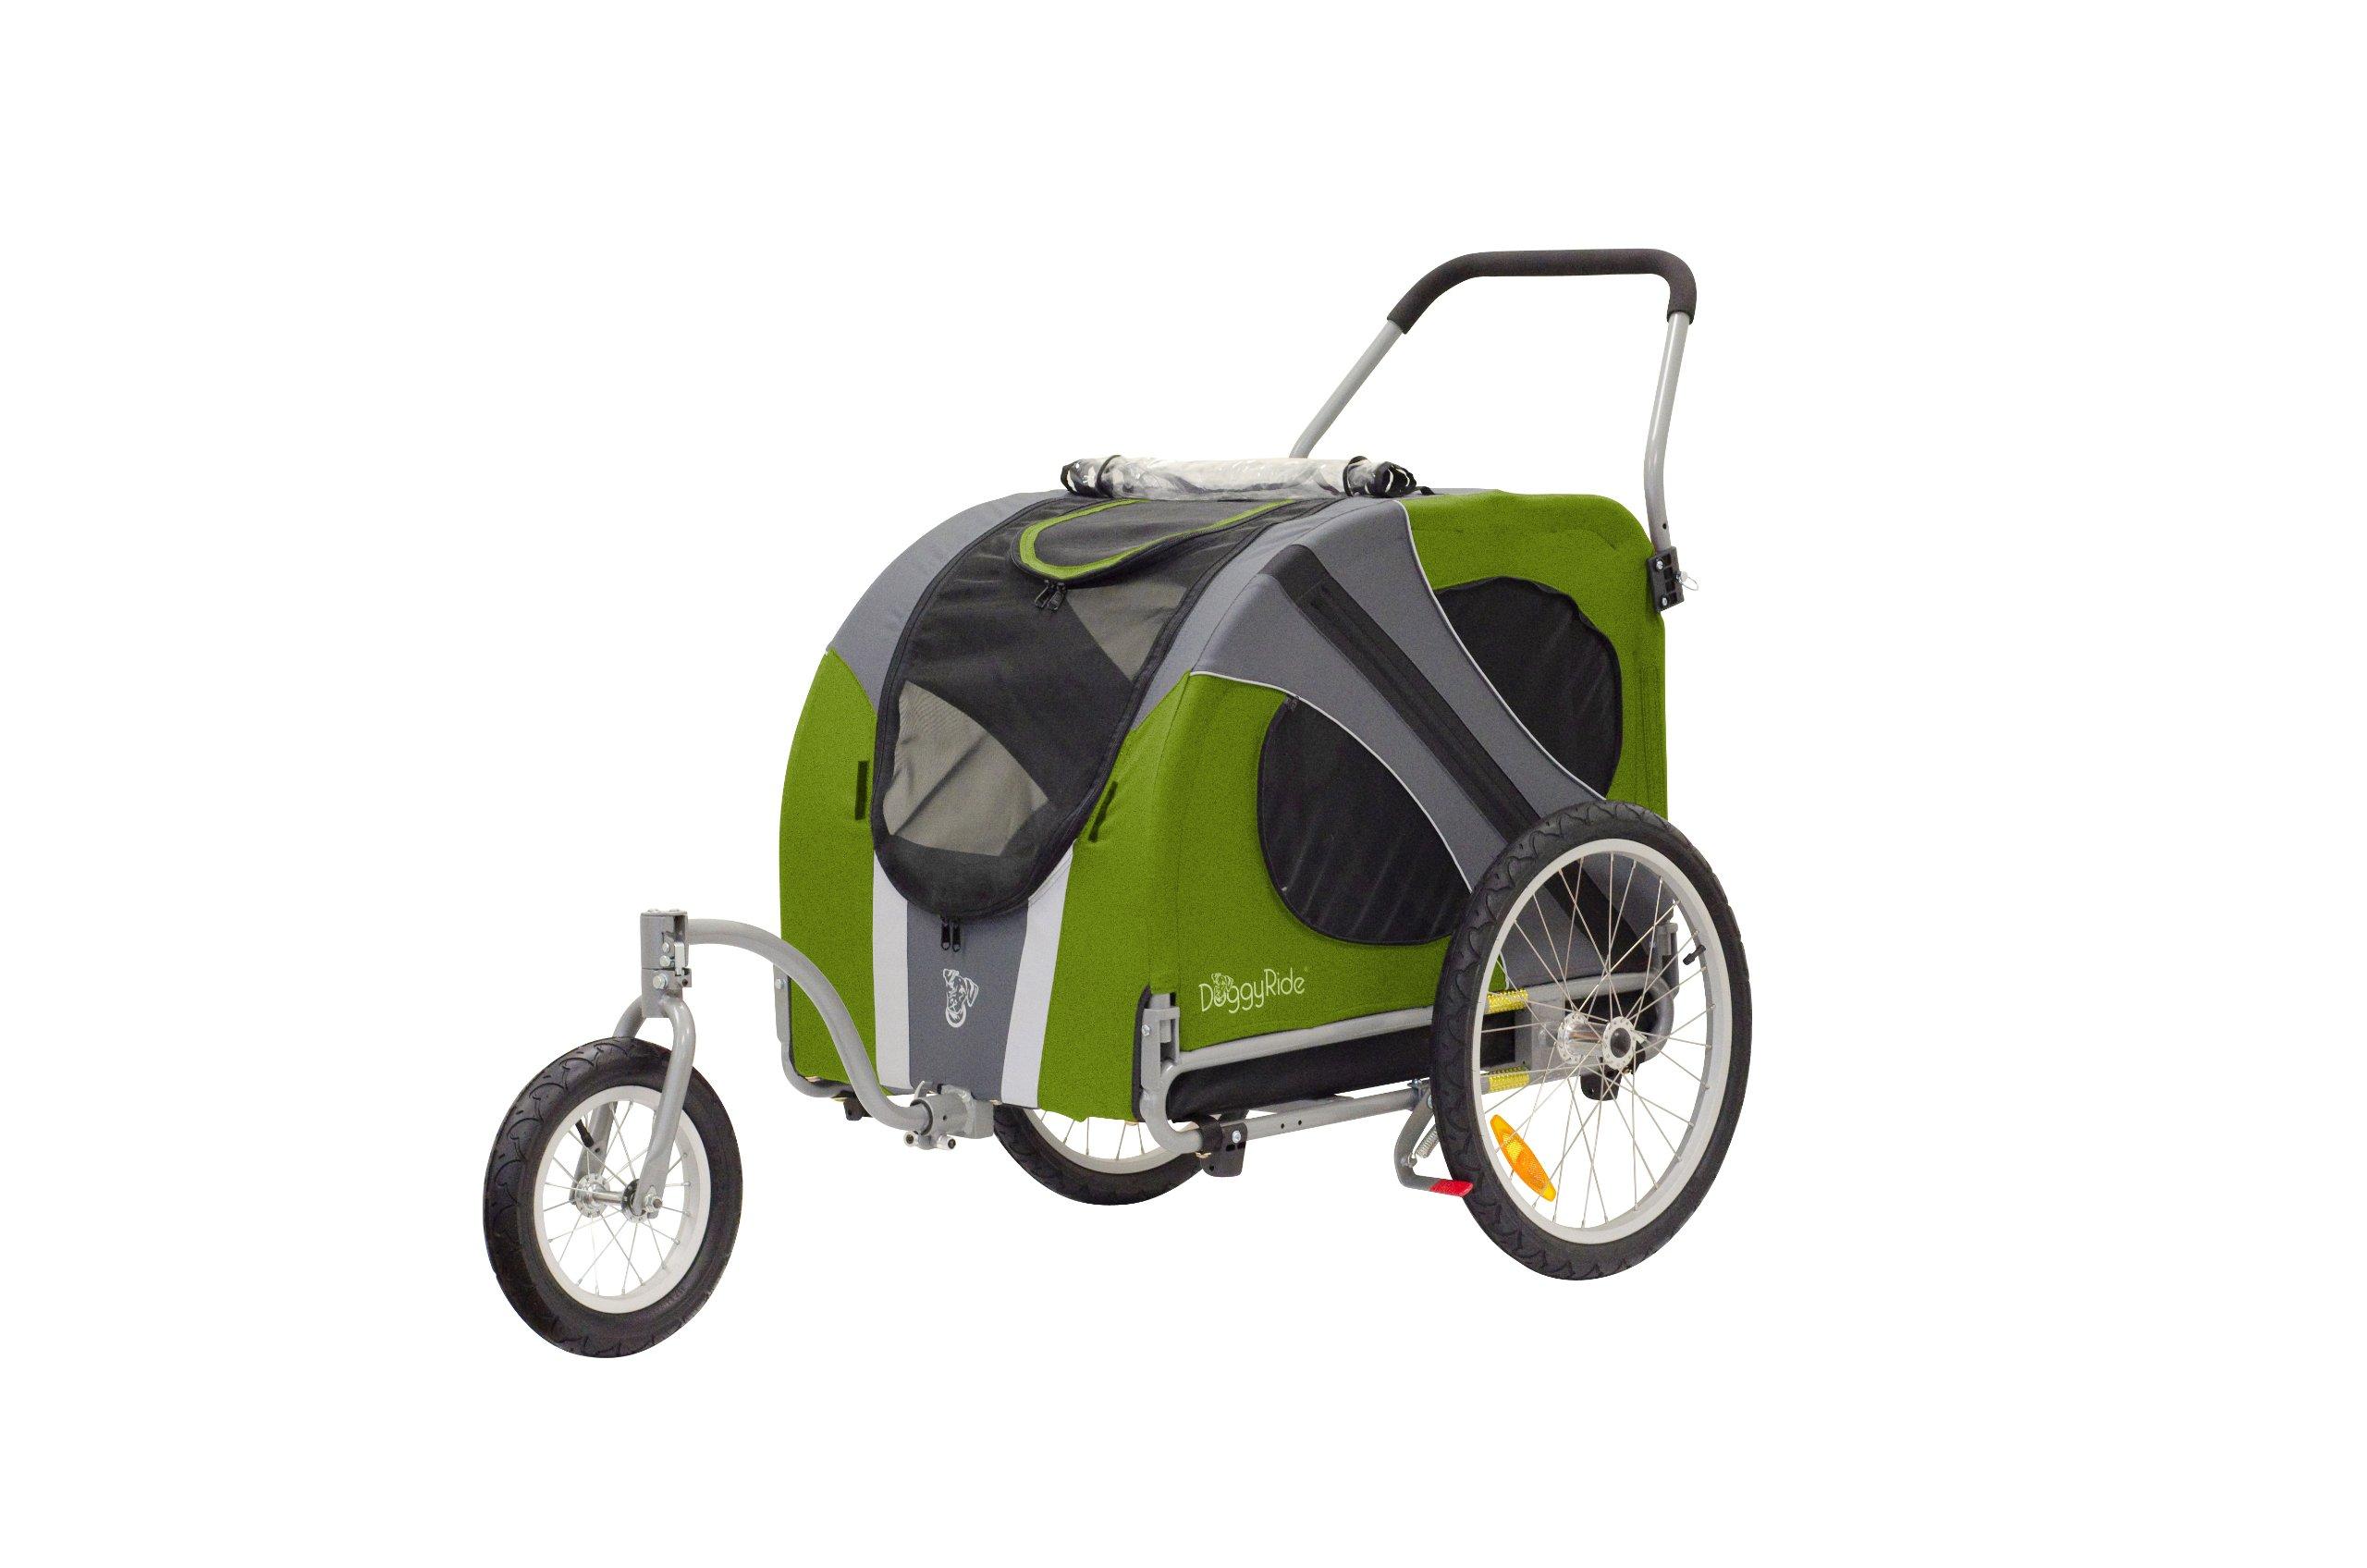 DoggyRide Novel Dog Jogger-Stroller, Outdoors Green